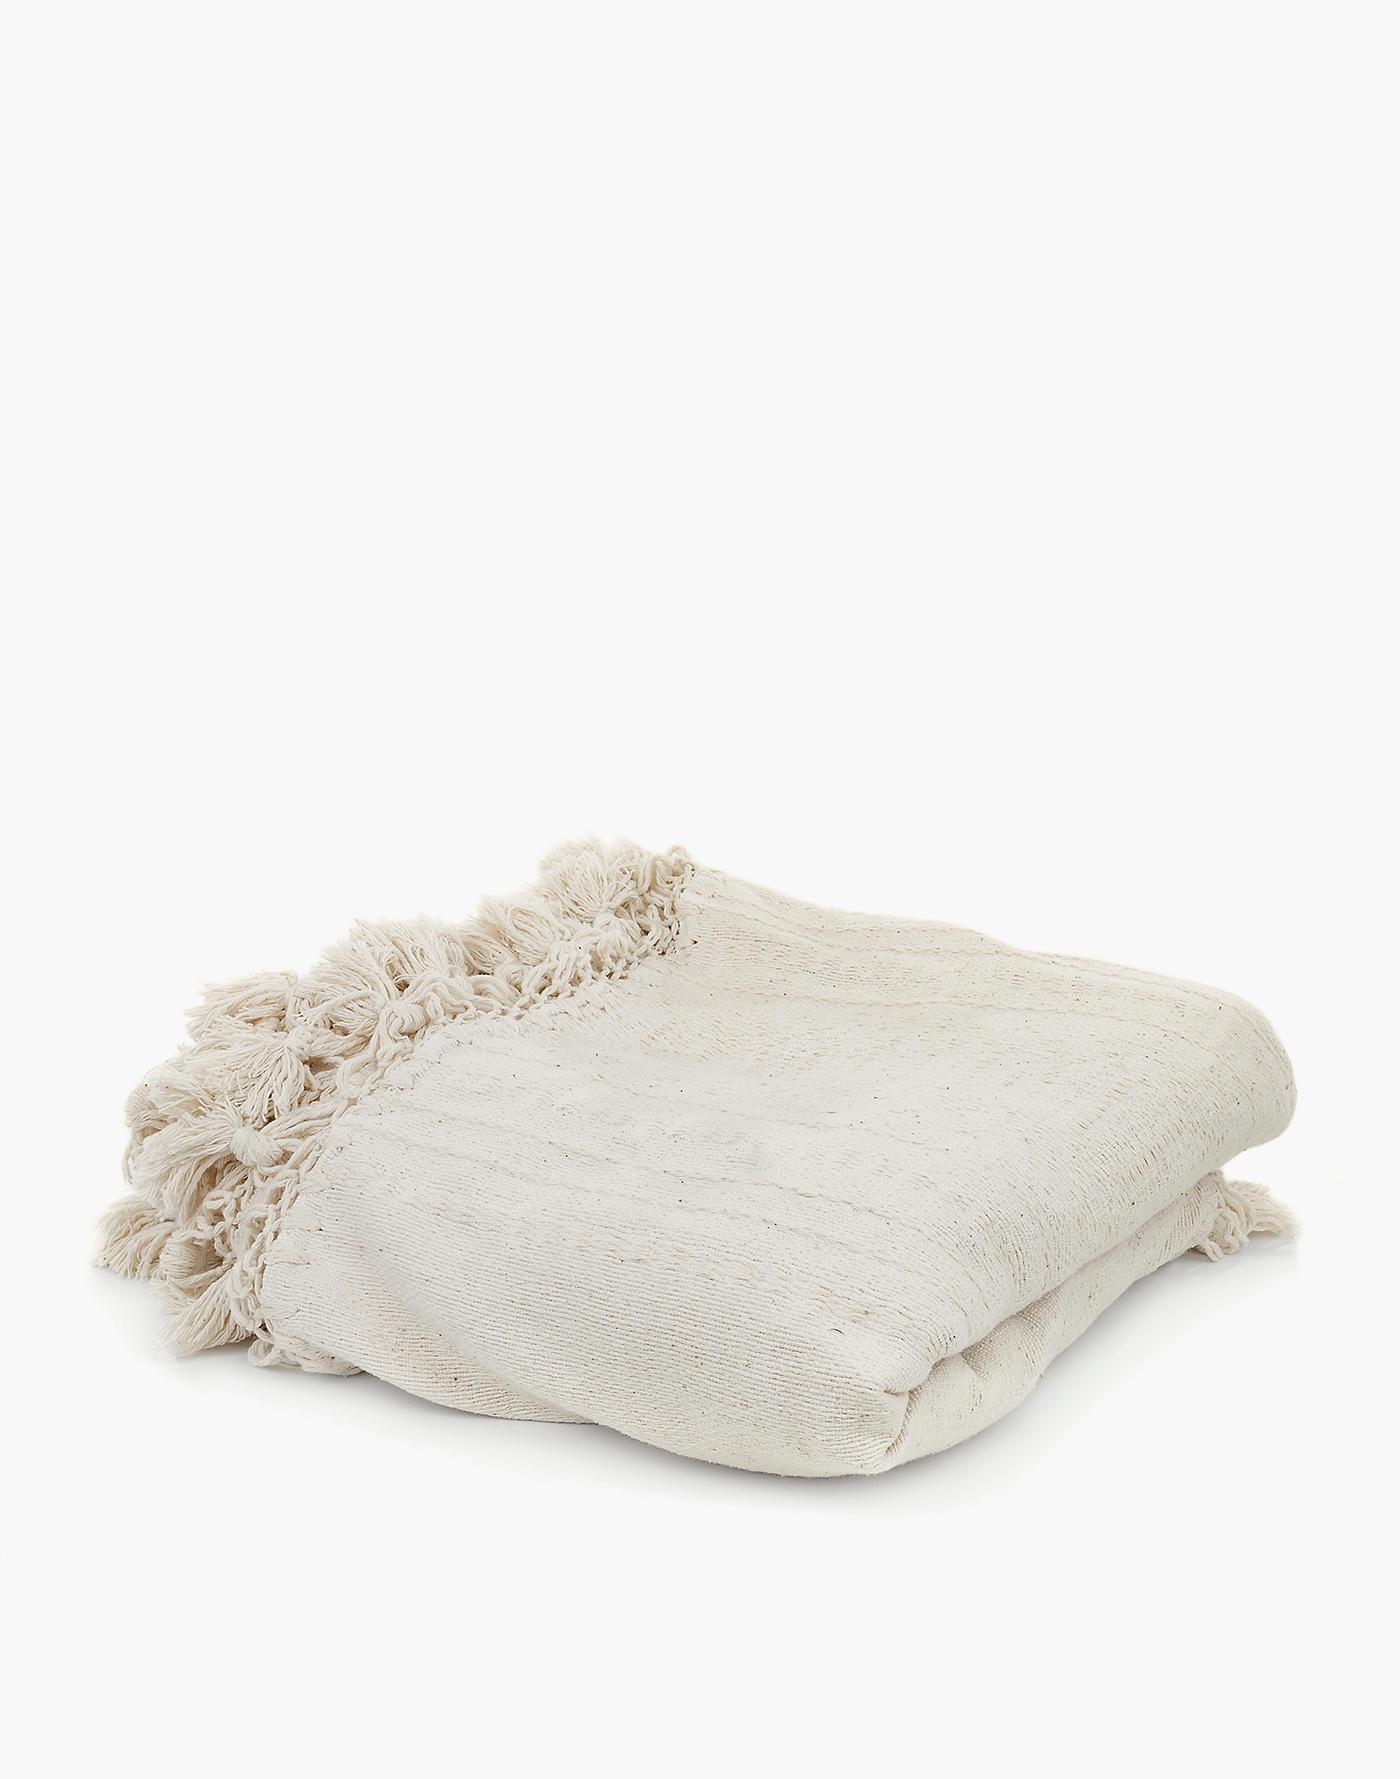 Madewell Nativa Twin/Full Bedspread